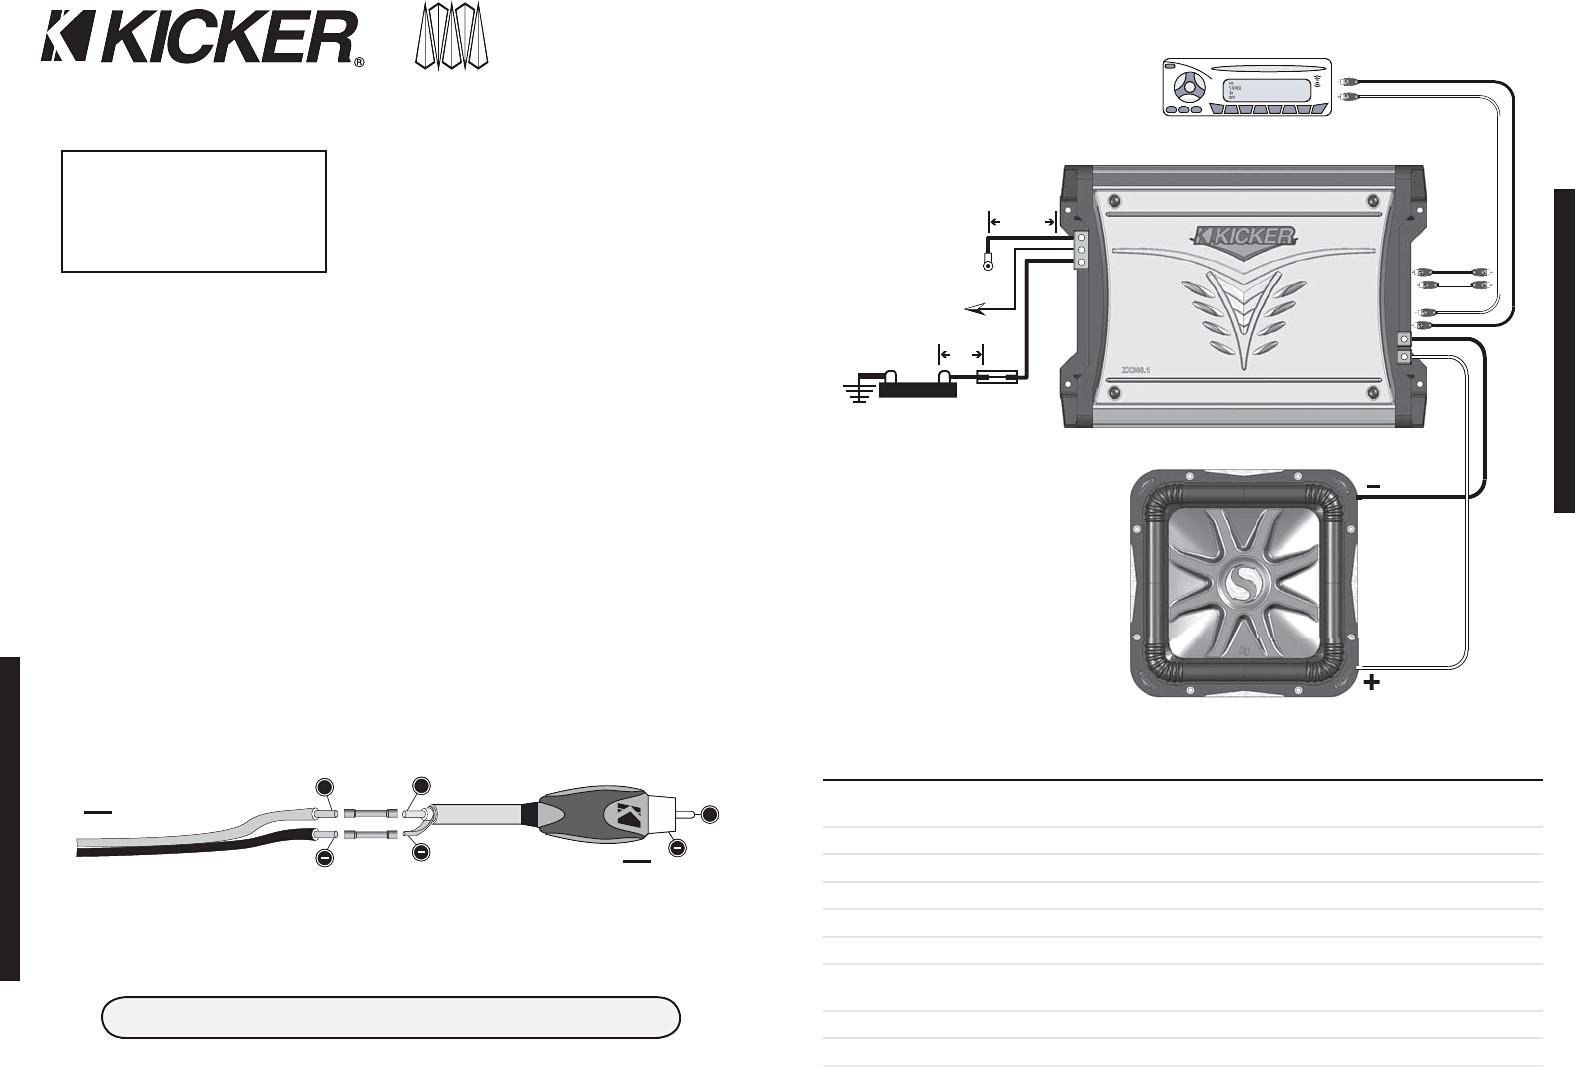 L7 Wiring Diagram | Wiring Library - Kicker Wiring Diagram